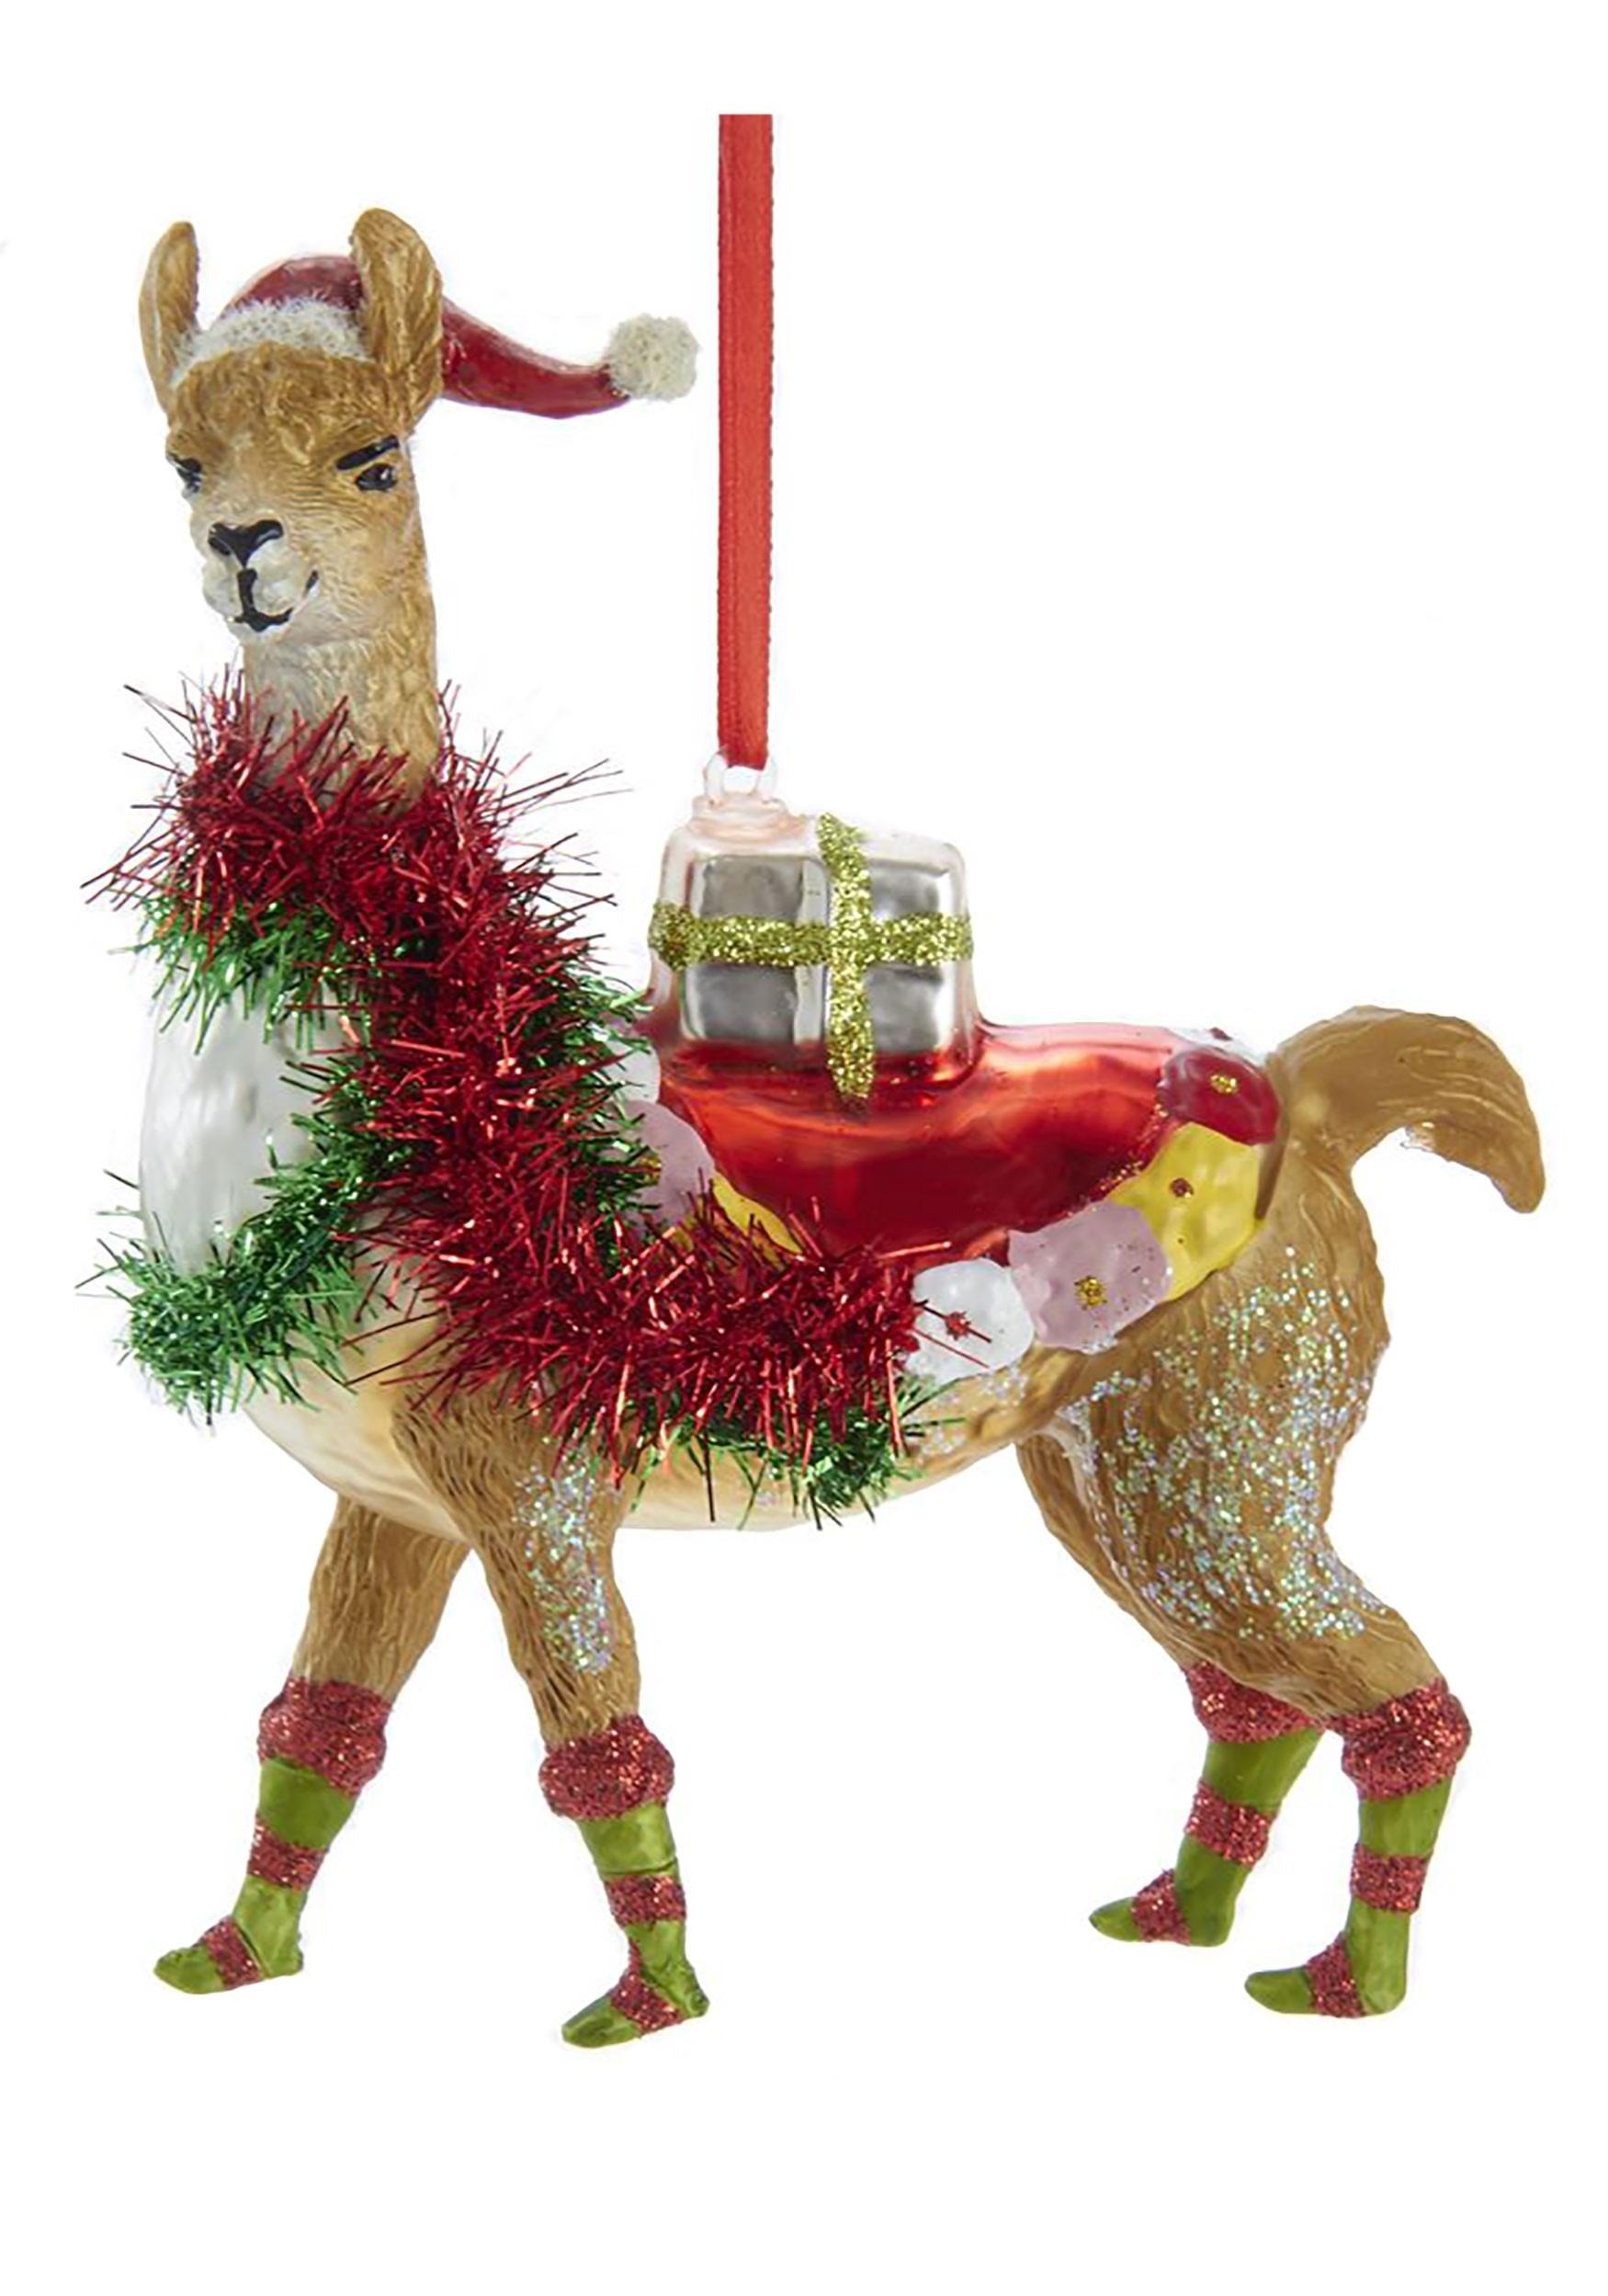 Christmas Llama.5 Glass Christmas Llama Ornament